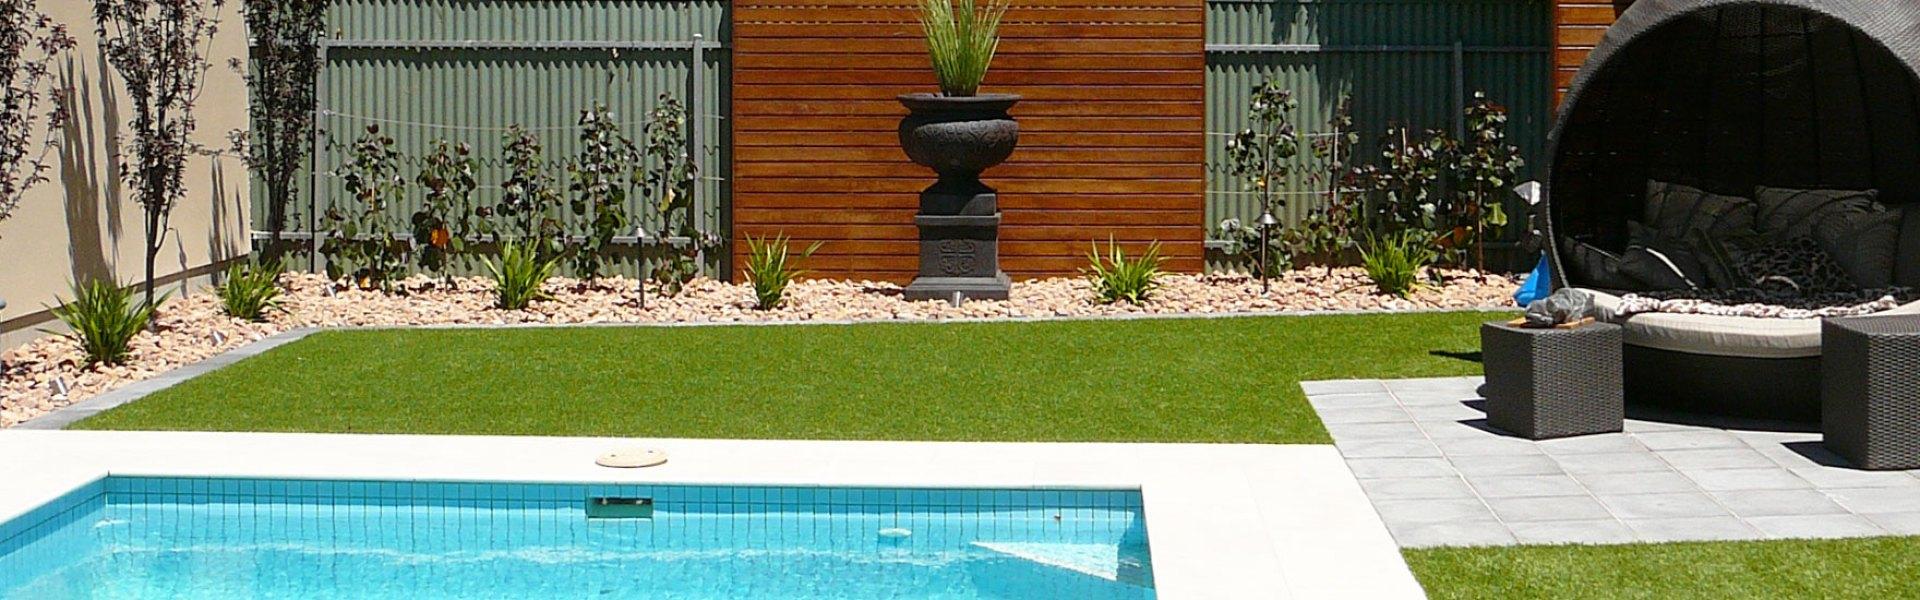 Low Maintenance Landscaping Adelaide | Visual Landscape Gardening